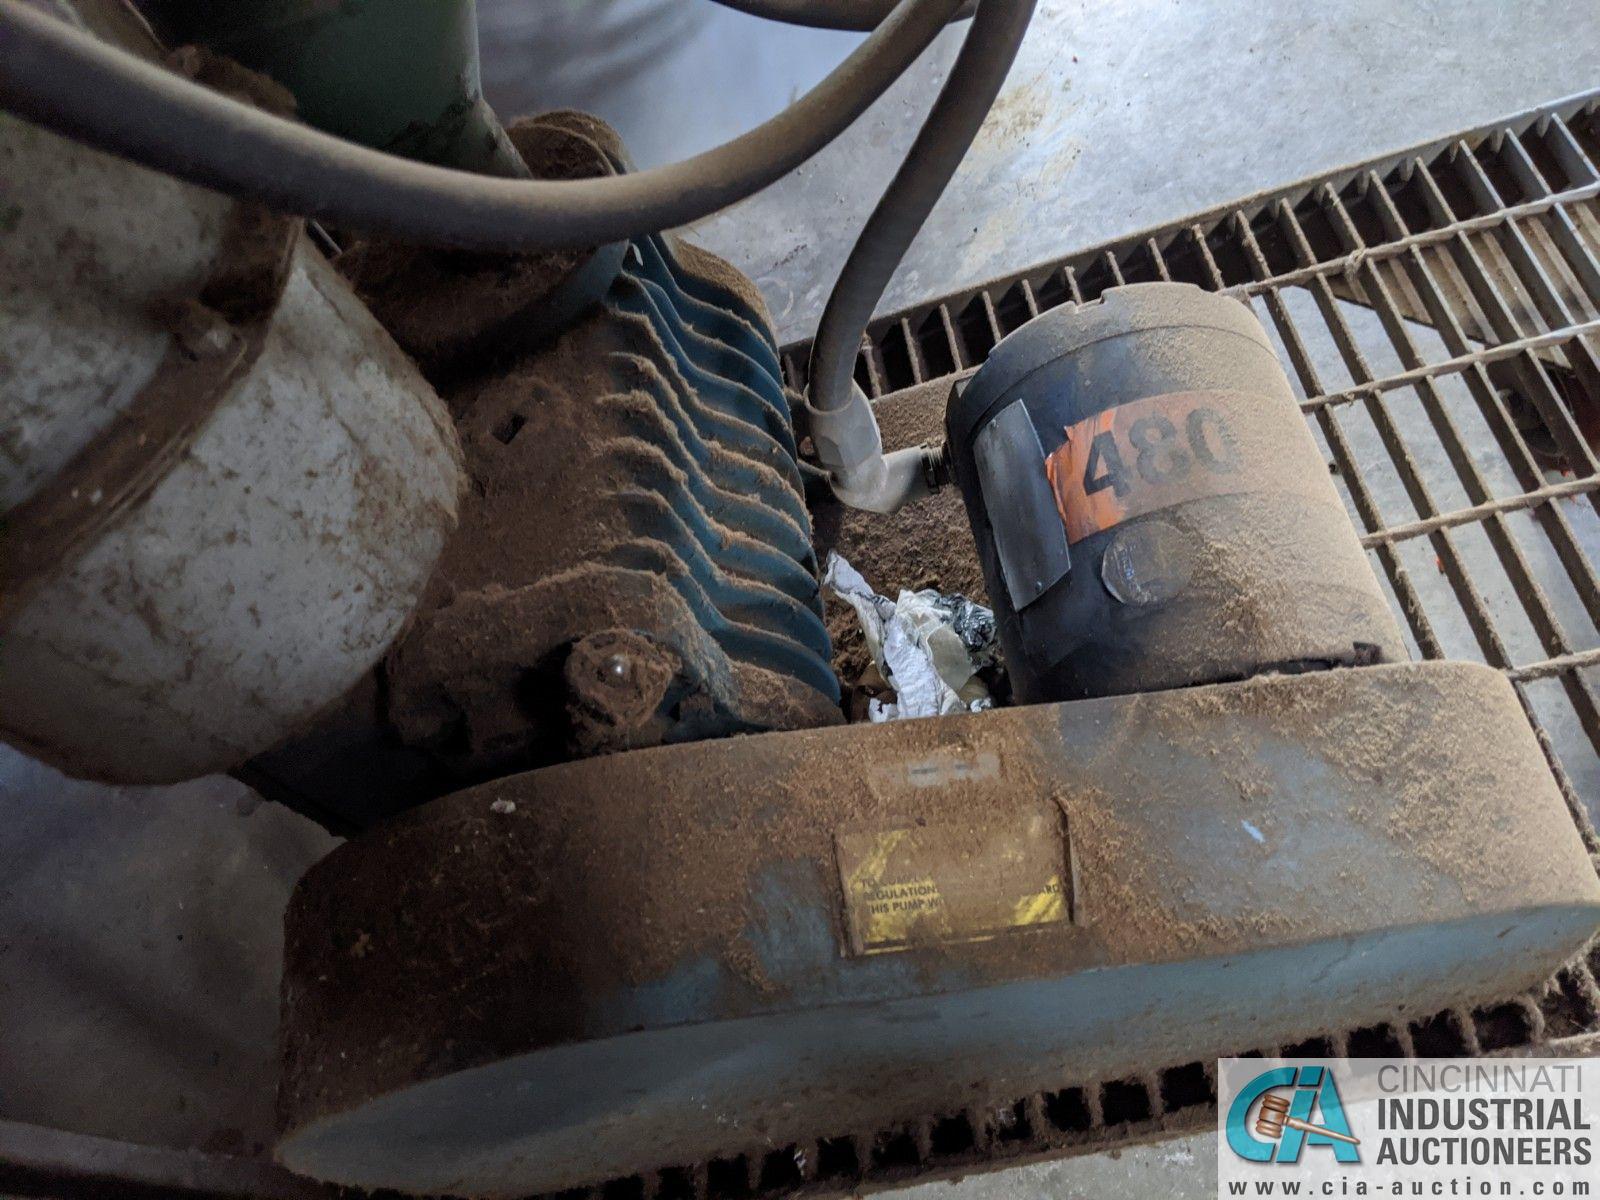 3-HP KINNEY VACUUM PUMP (8635 East Ave., Mentor, OH 44060 - John Magnasum: 440-667-9414) - Image 5 of 5